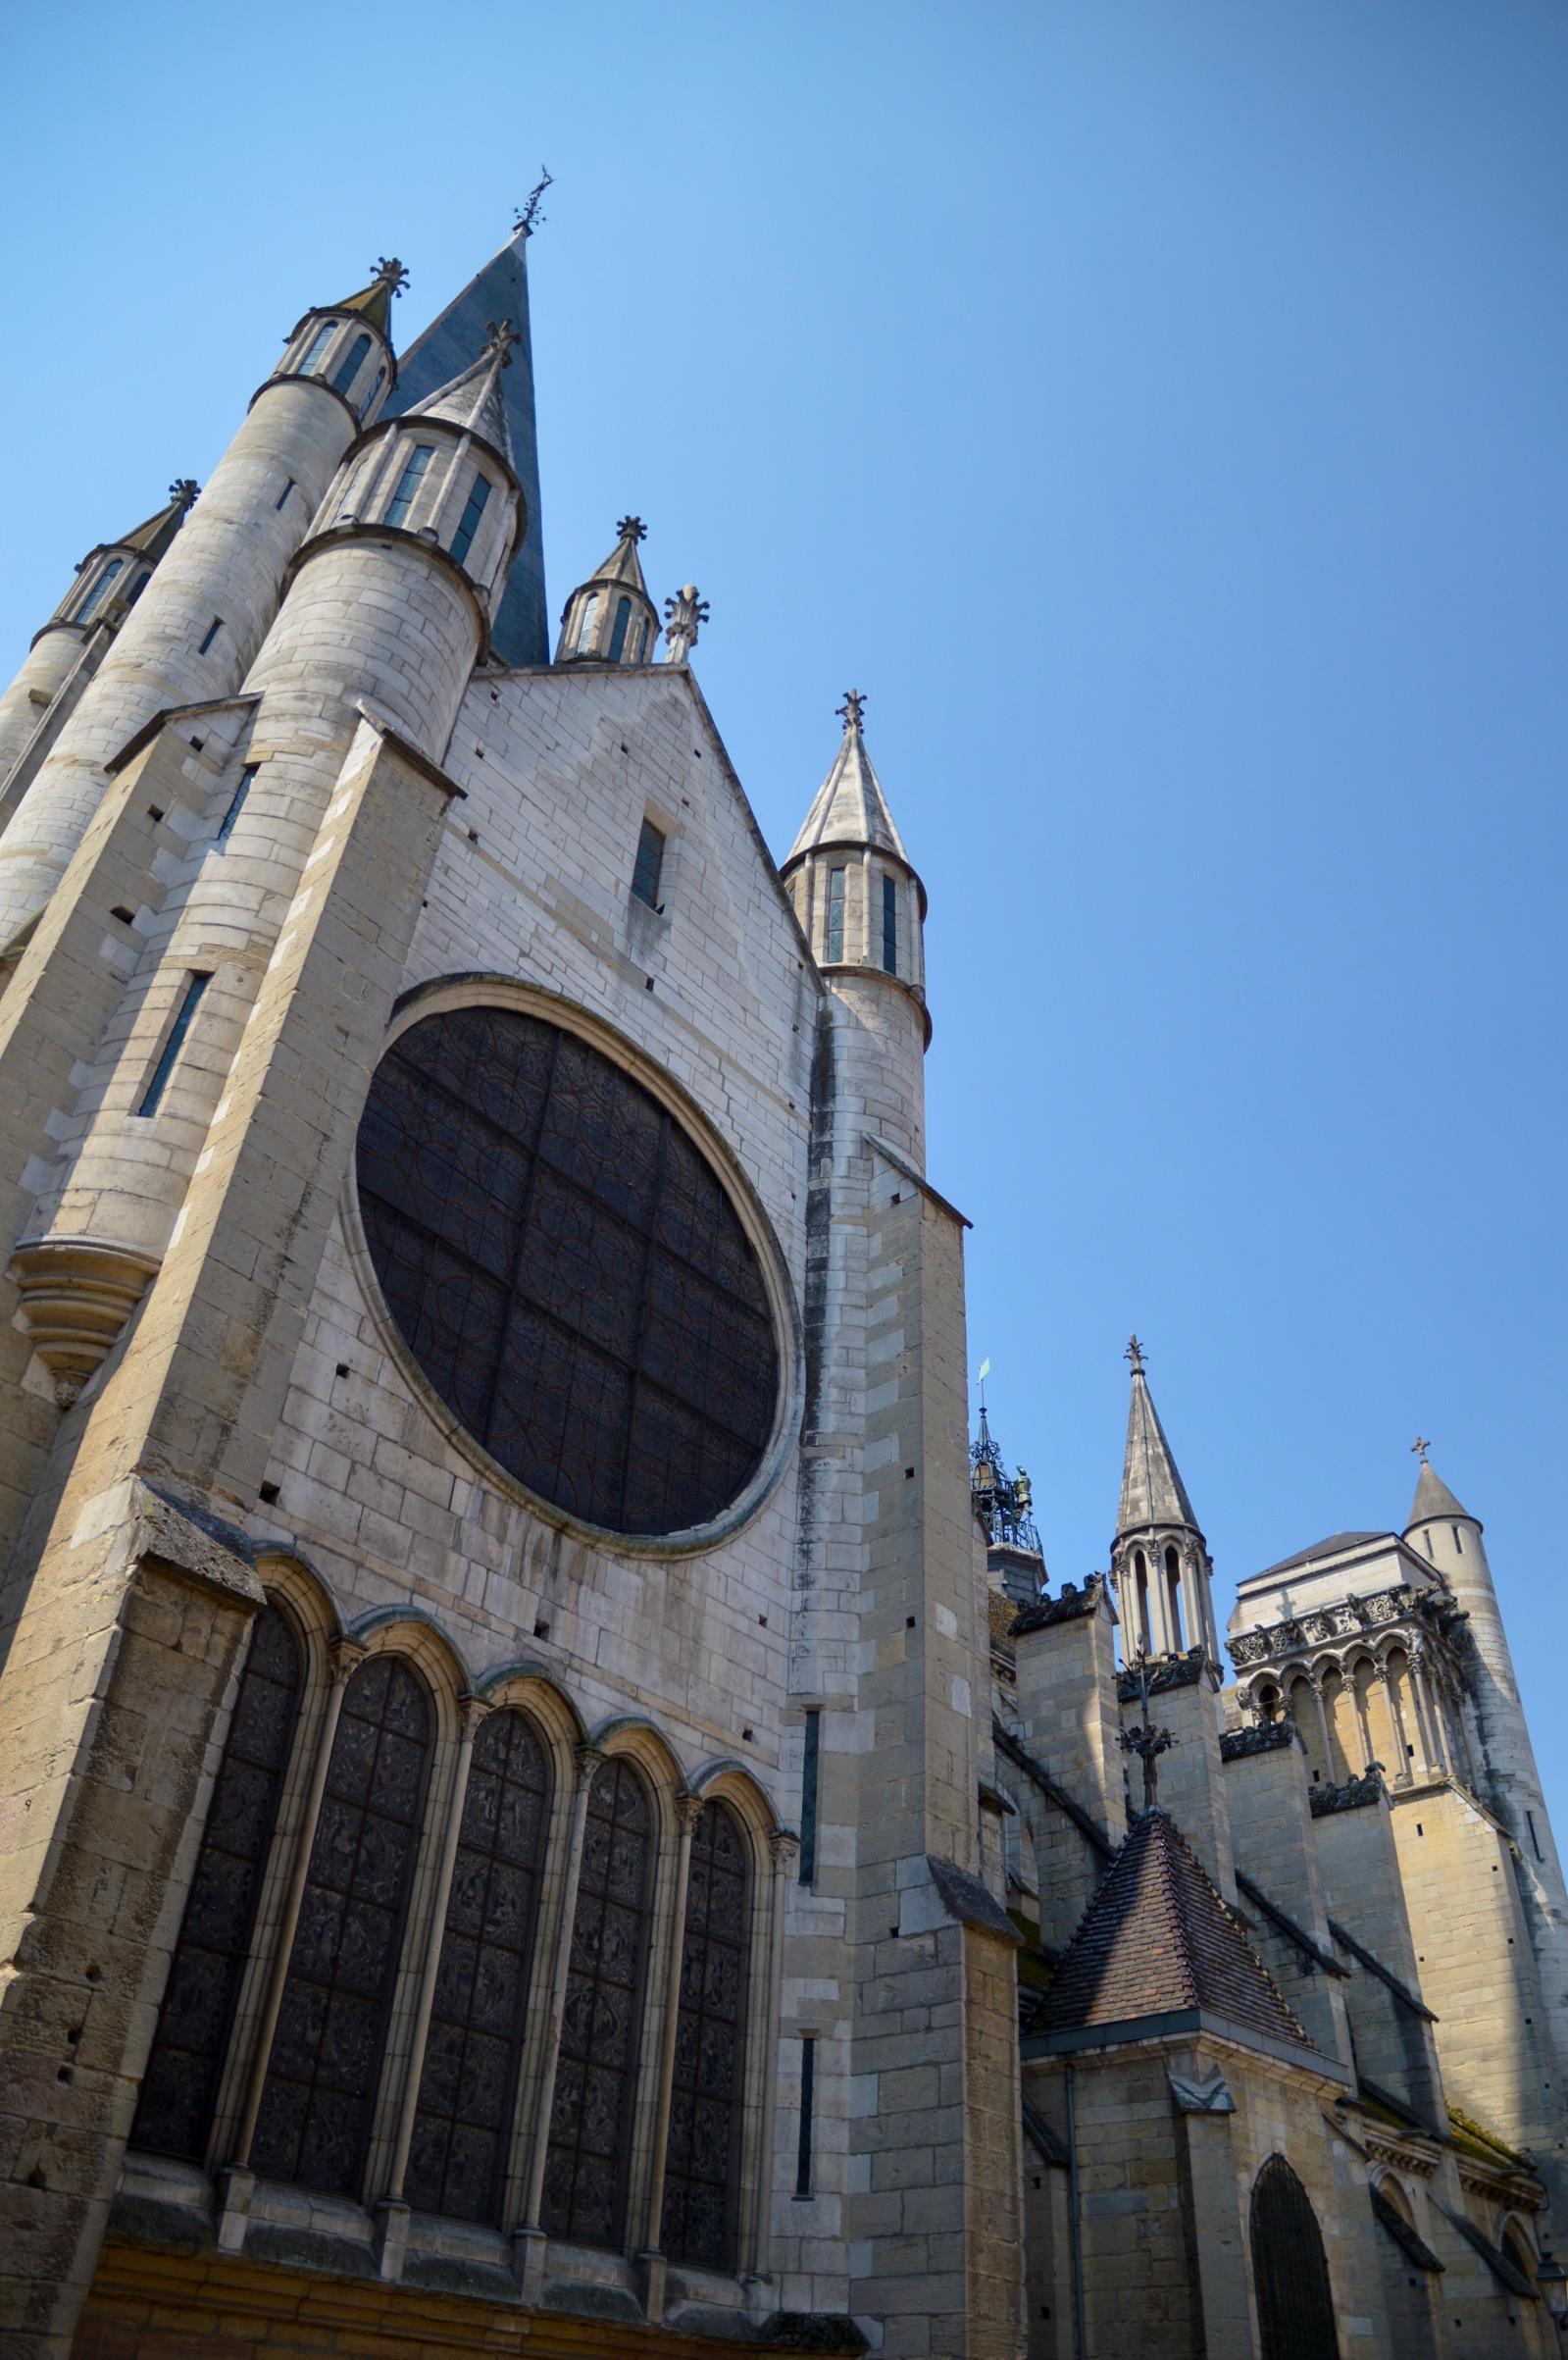 Église Saint-Michel, Dijon, France